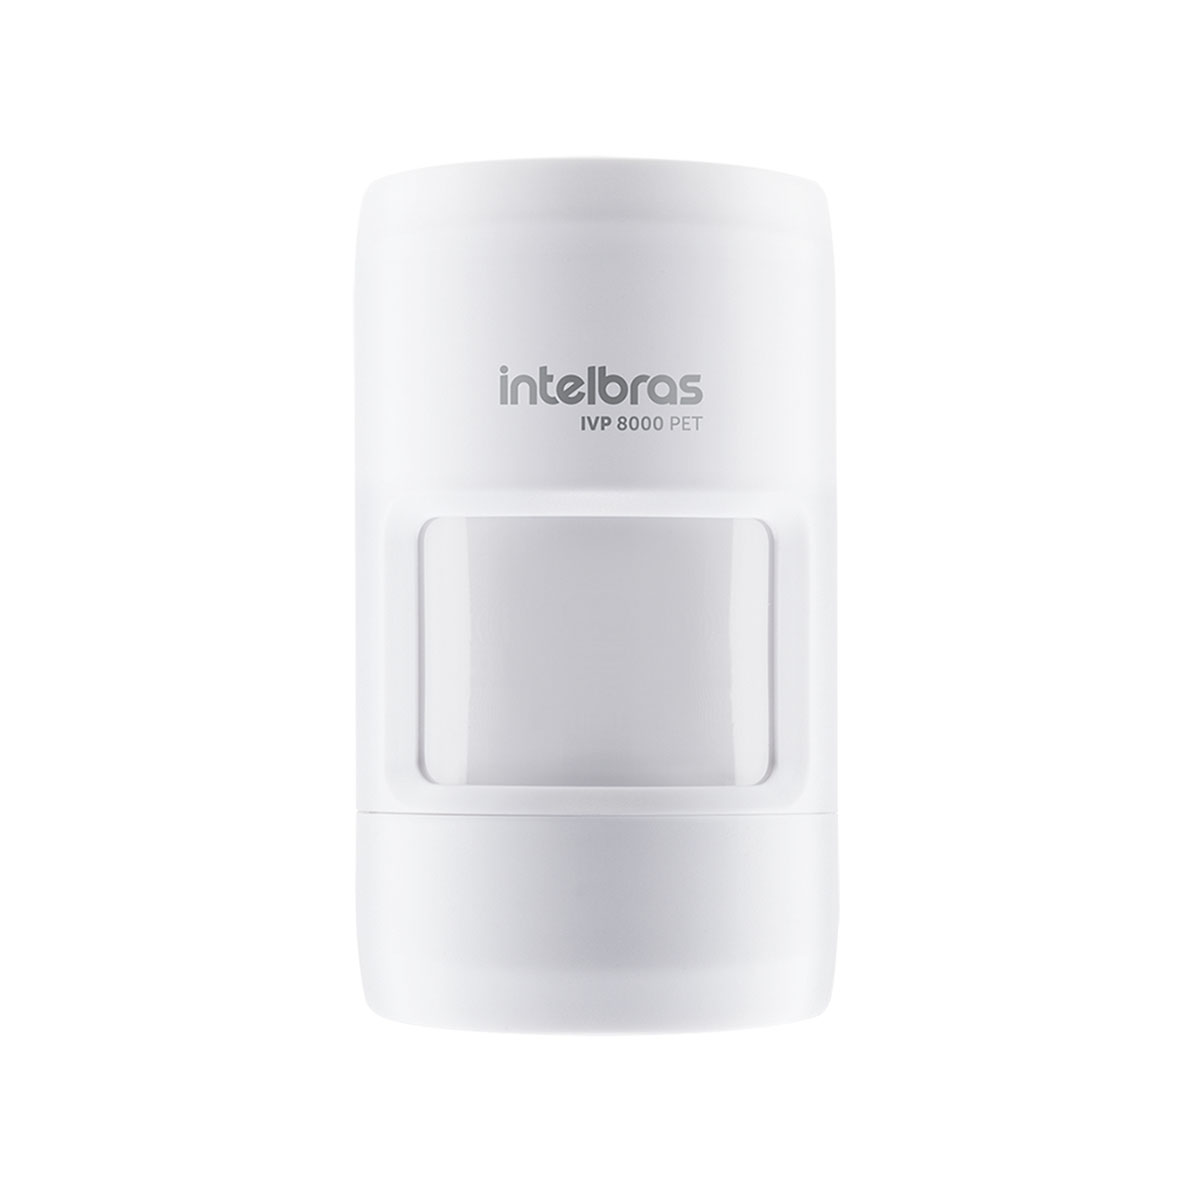 Kit 05 Sensor Passivo Sem Fio Intelbras Ivp 8000 Pet